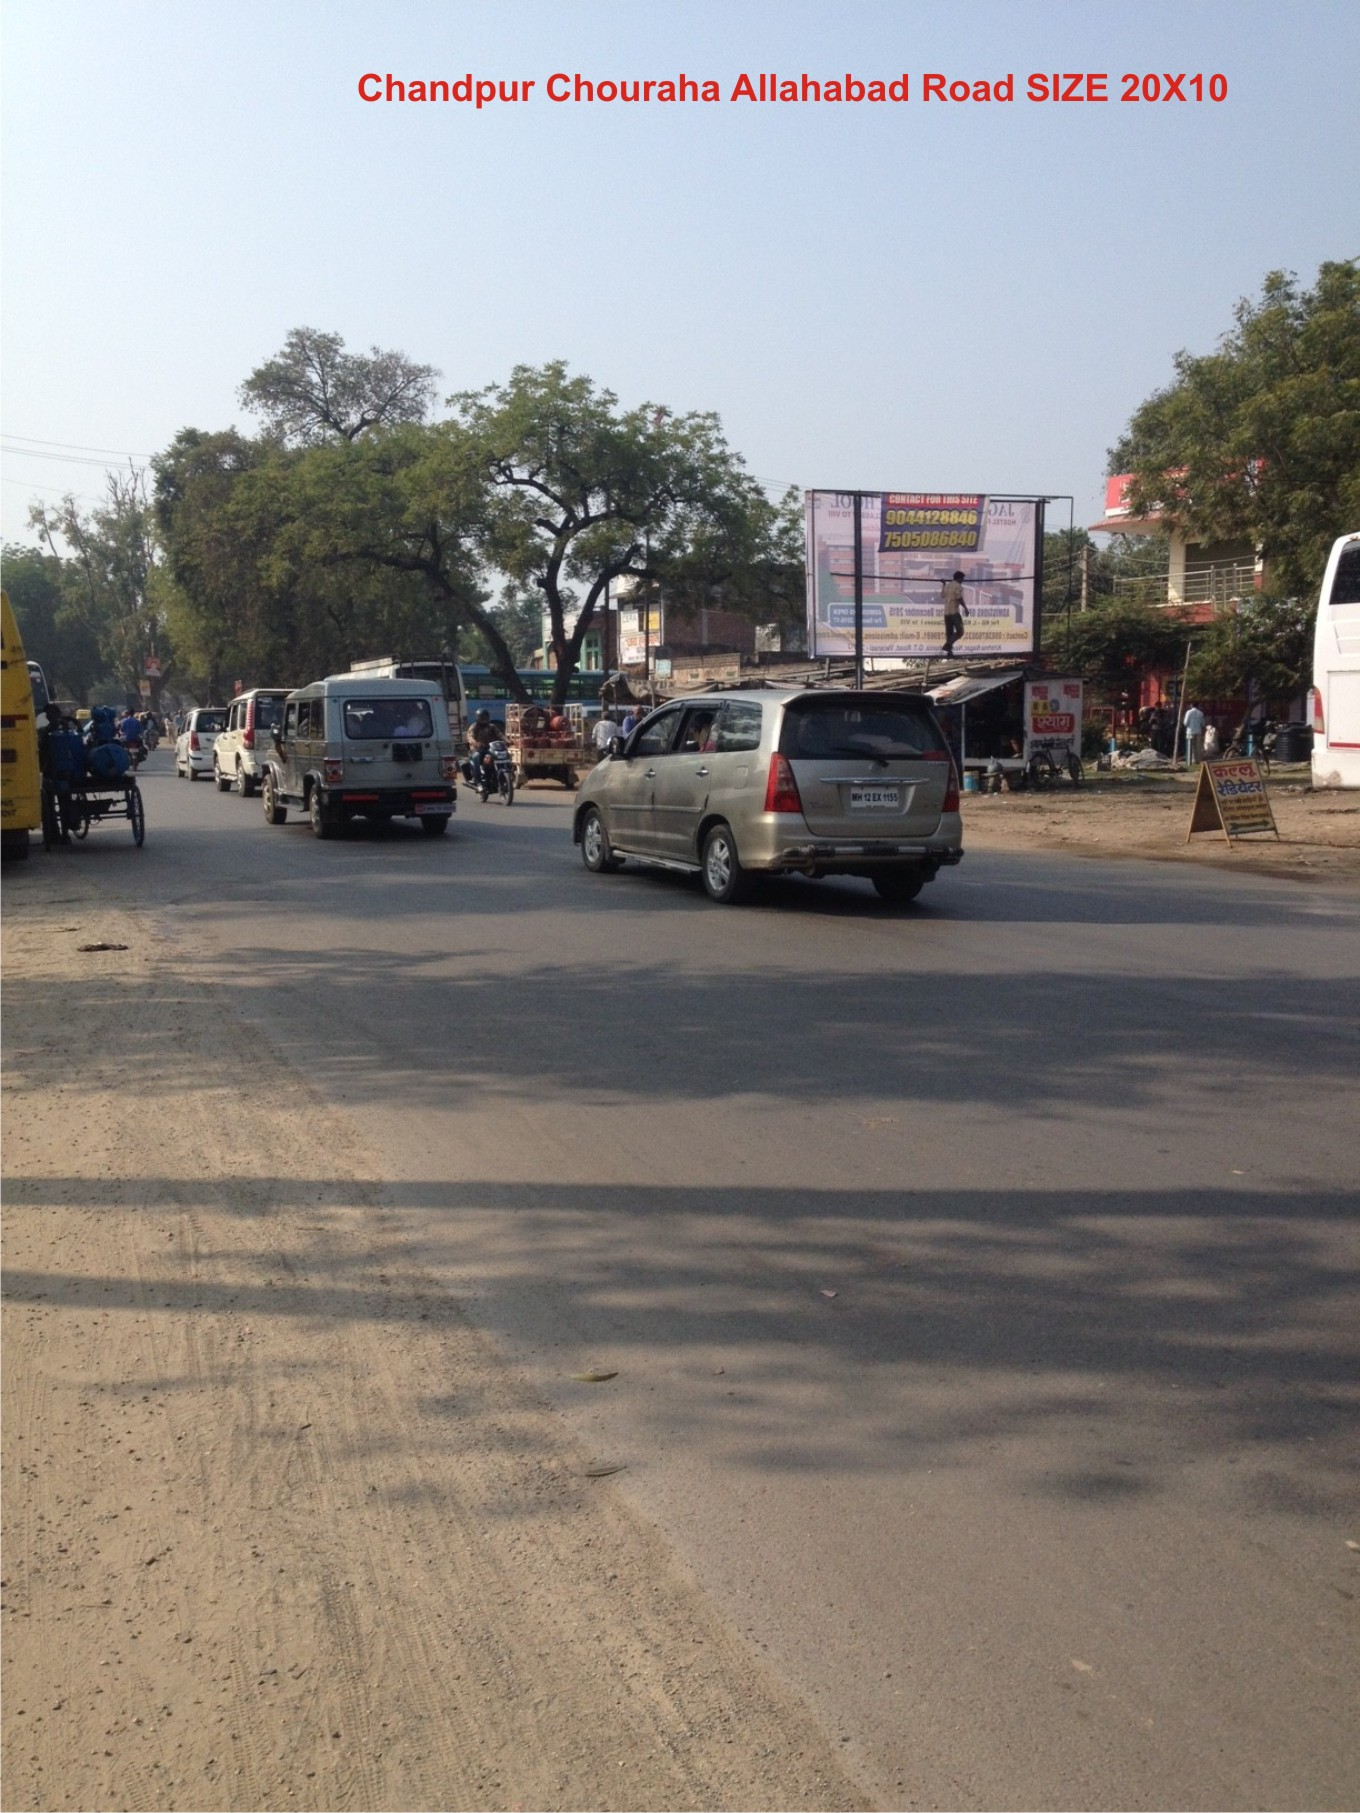 CHANDPUR, Varanasi